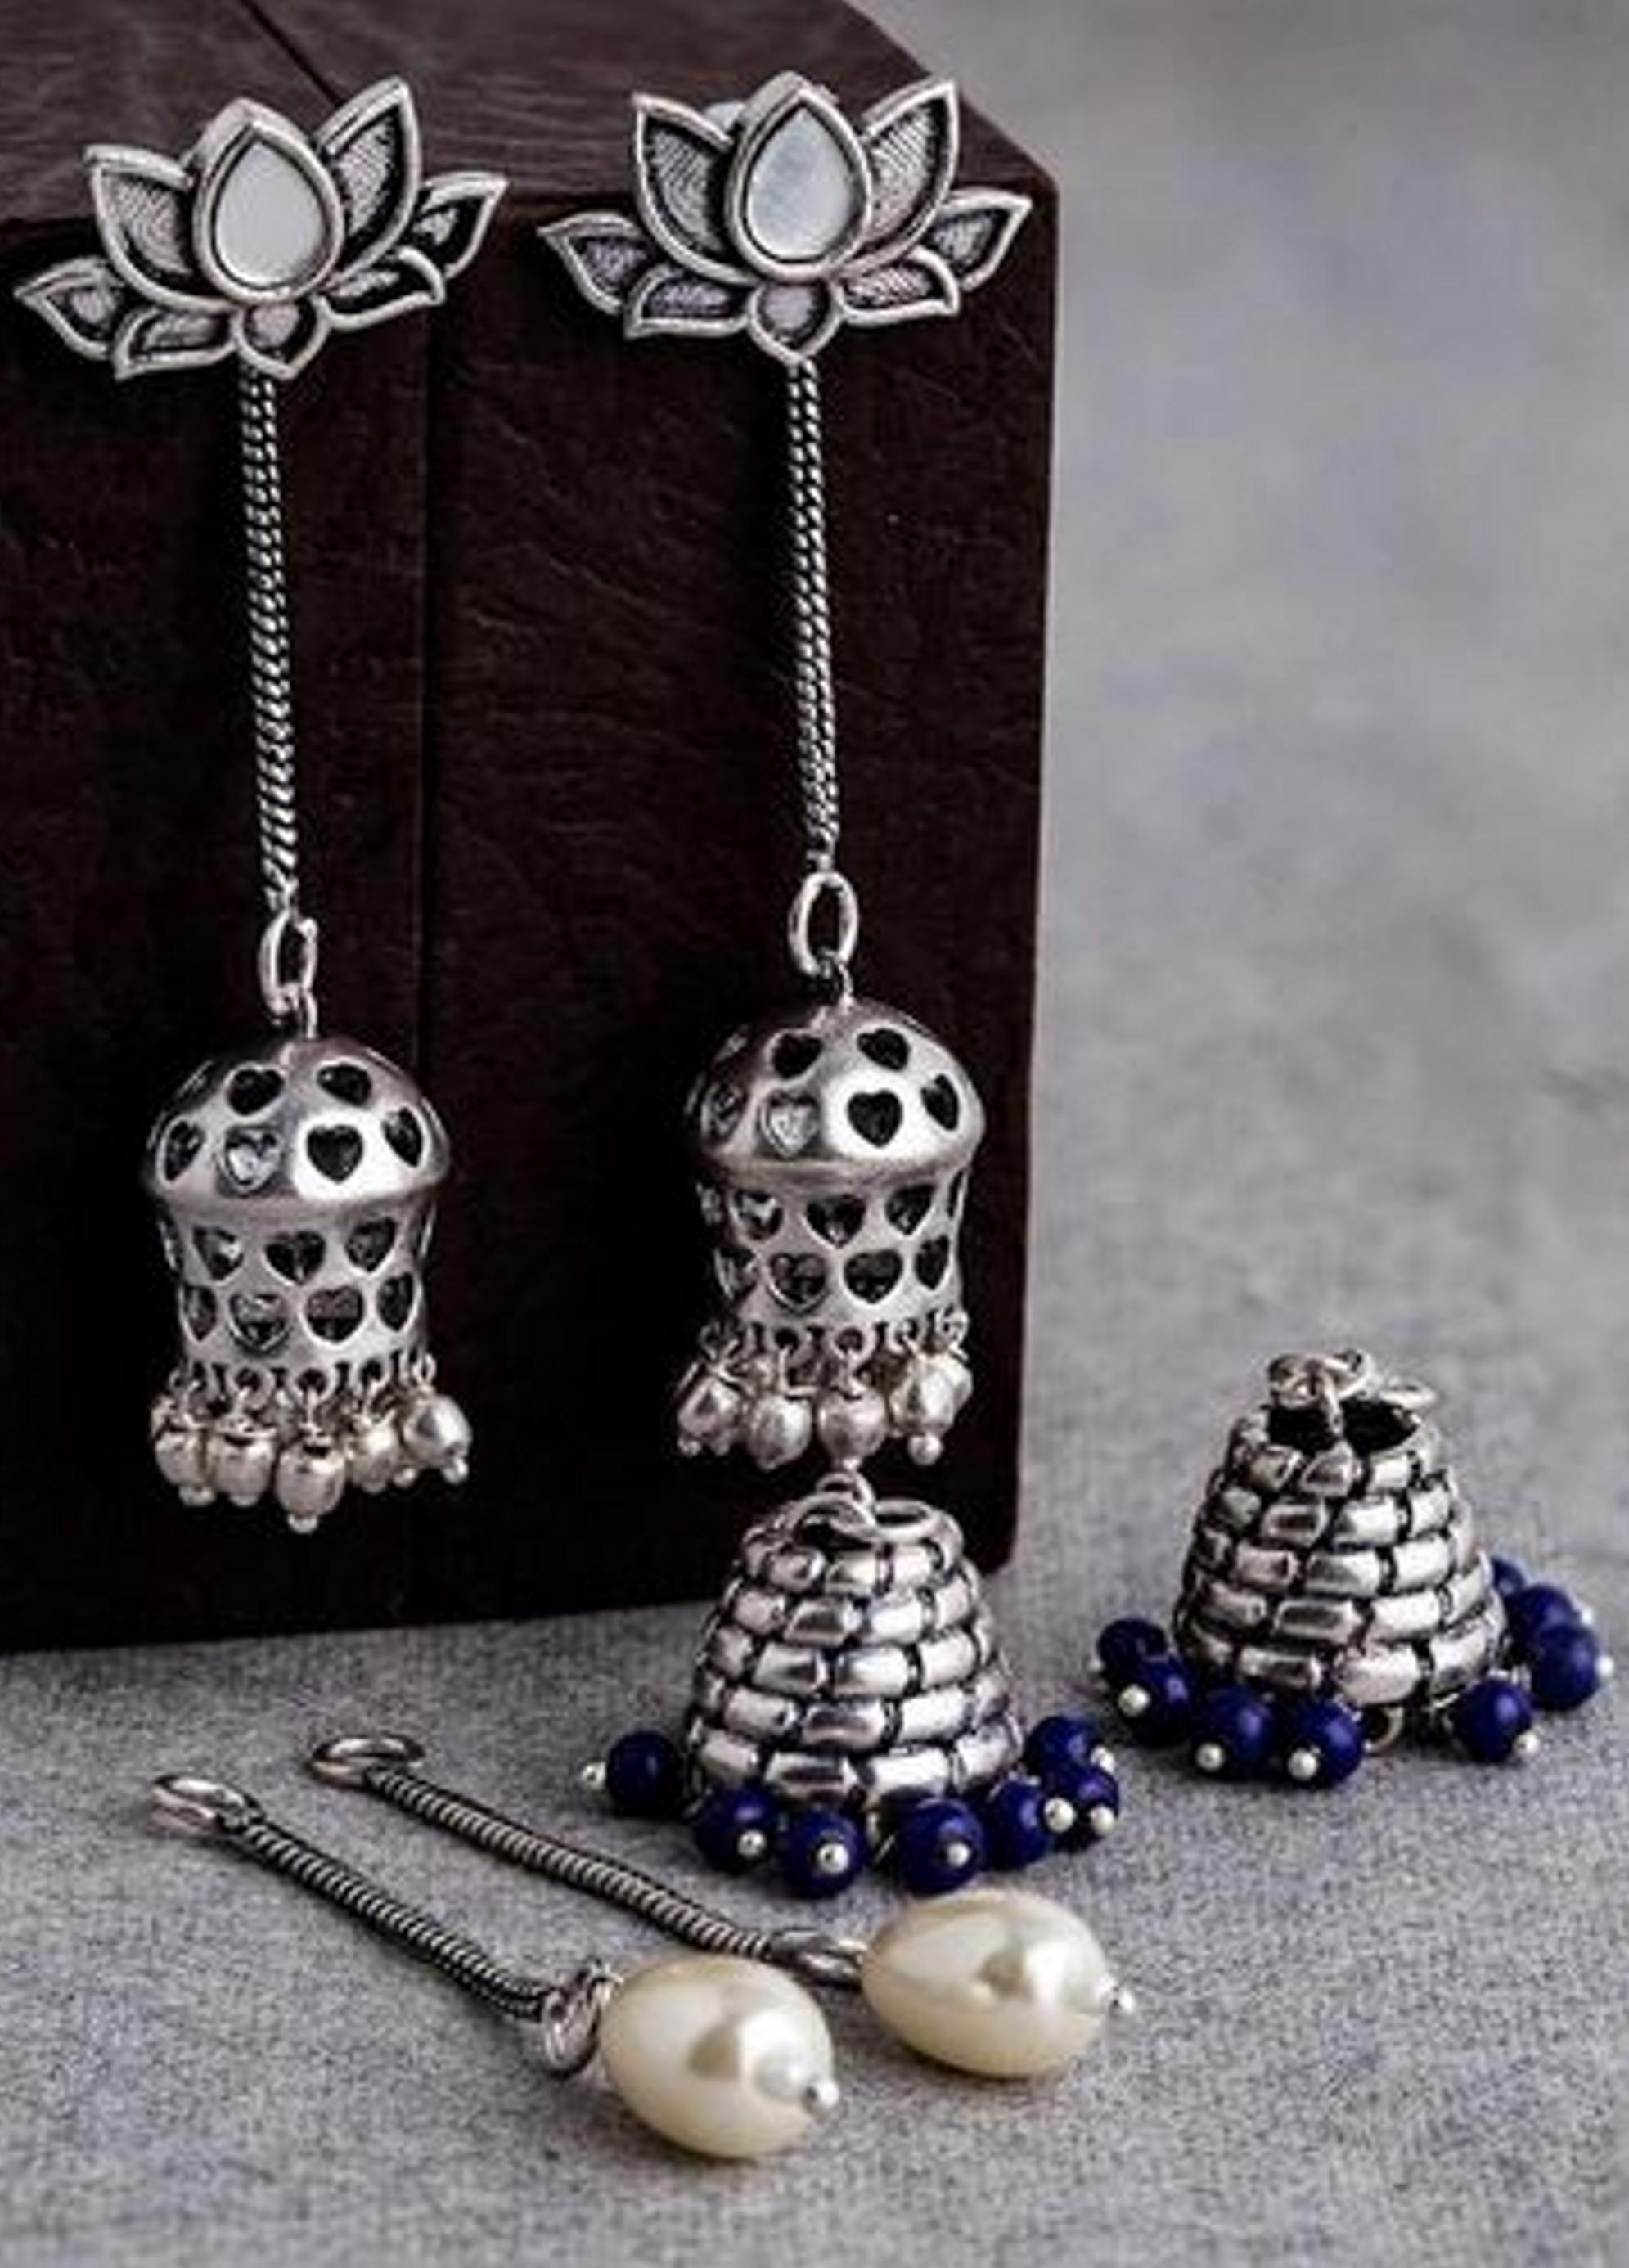 4 in One Oxidised Interchangeable Danglers | VOYLLA Fashions | Fashion jewelry, Fashion earrings, Traditional earrings